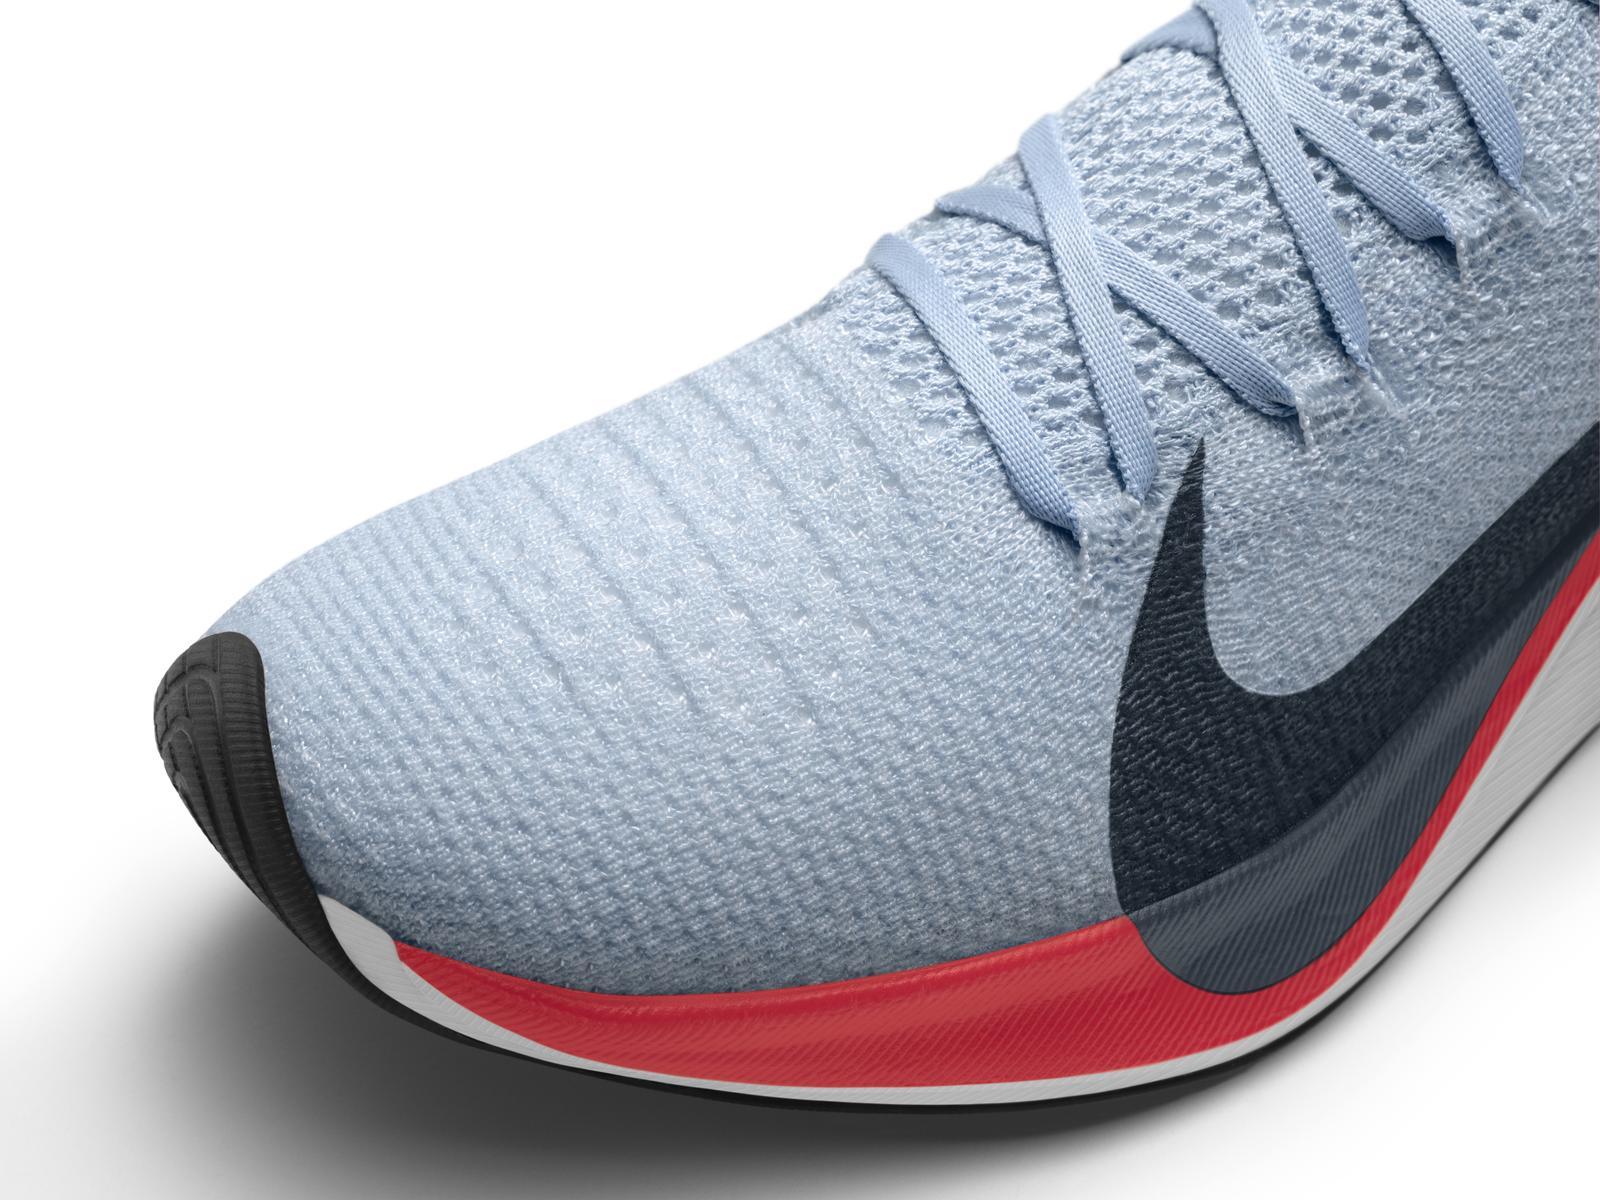 3e4fbbed6c7cb Nike Zoom Vaporfly Elite 2 - WearTesters